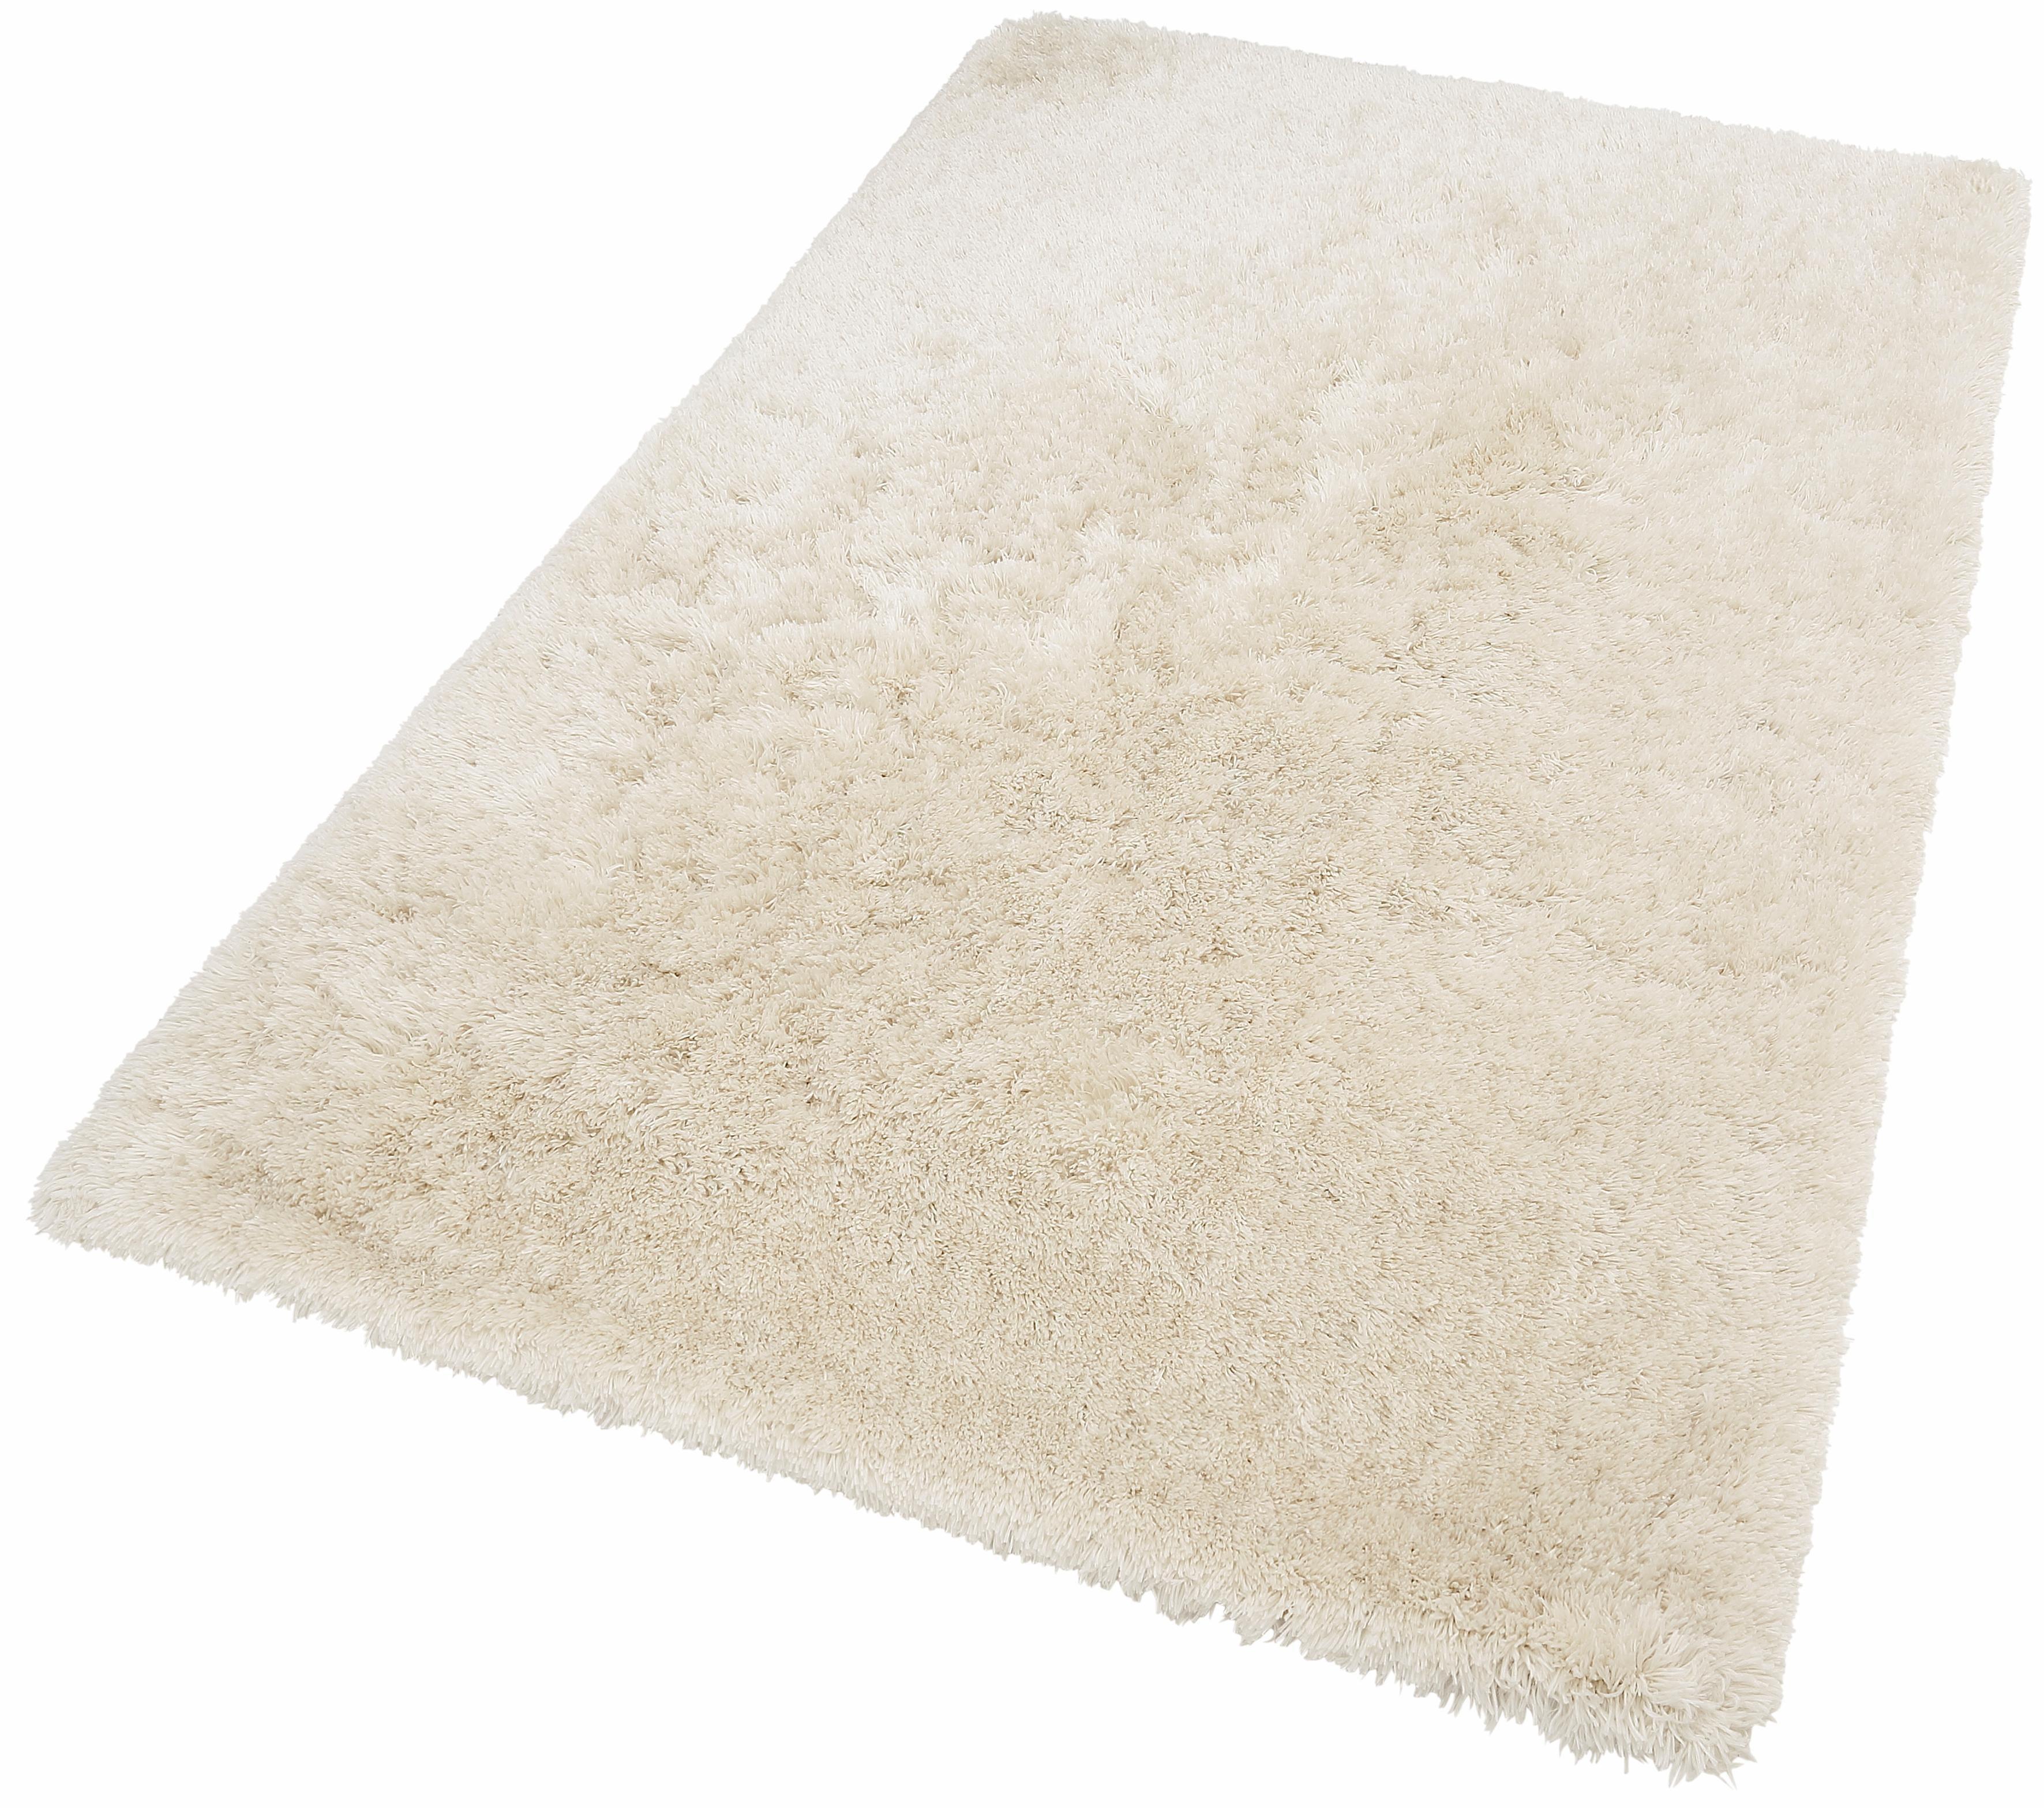 hochflor teppich flokato theko rechteckig h he 60 mm natur l b 140 70 cm l b 180 120. Black Bedroom Furniture Sets. Home Design Ideas